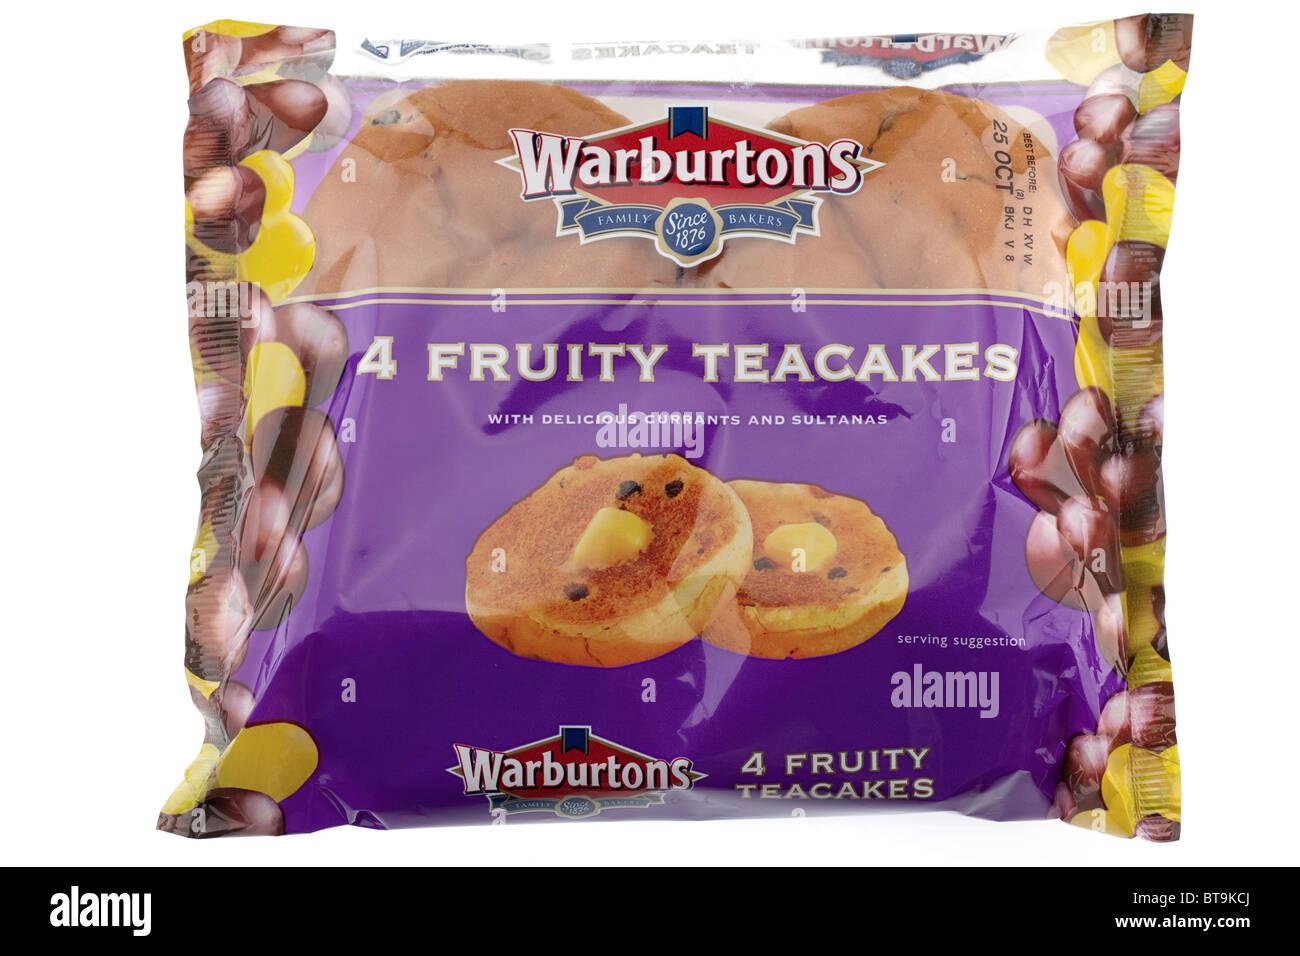 Cellophane packet of Warburton's 4 fruity teacakes - Stock Image